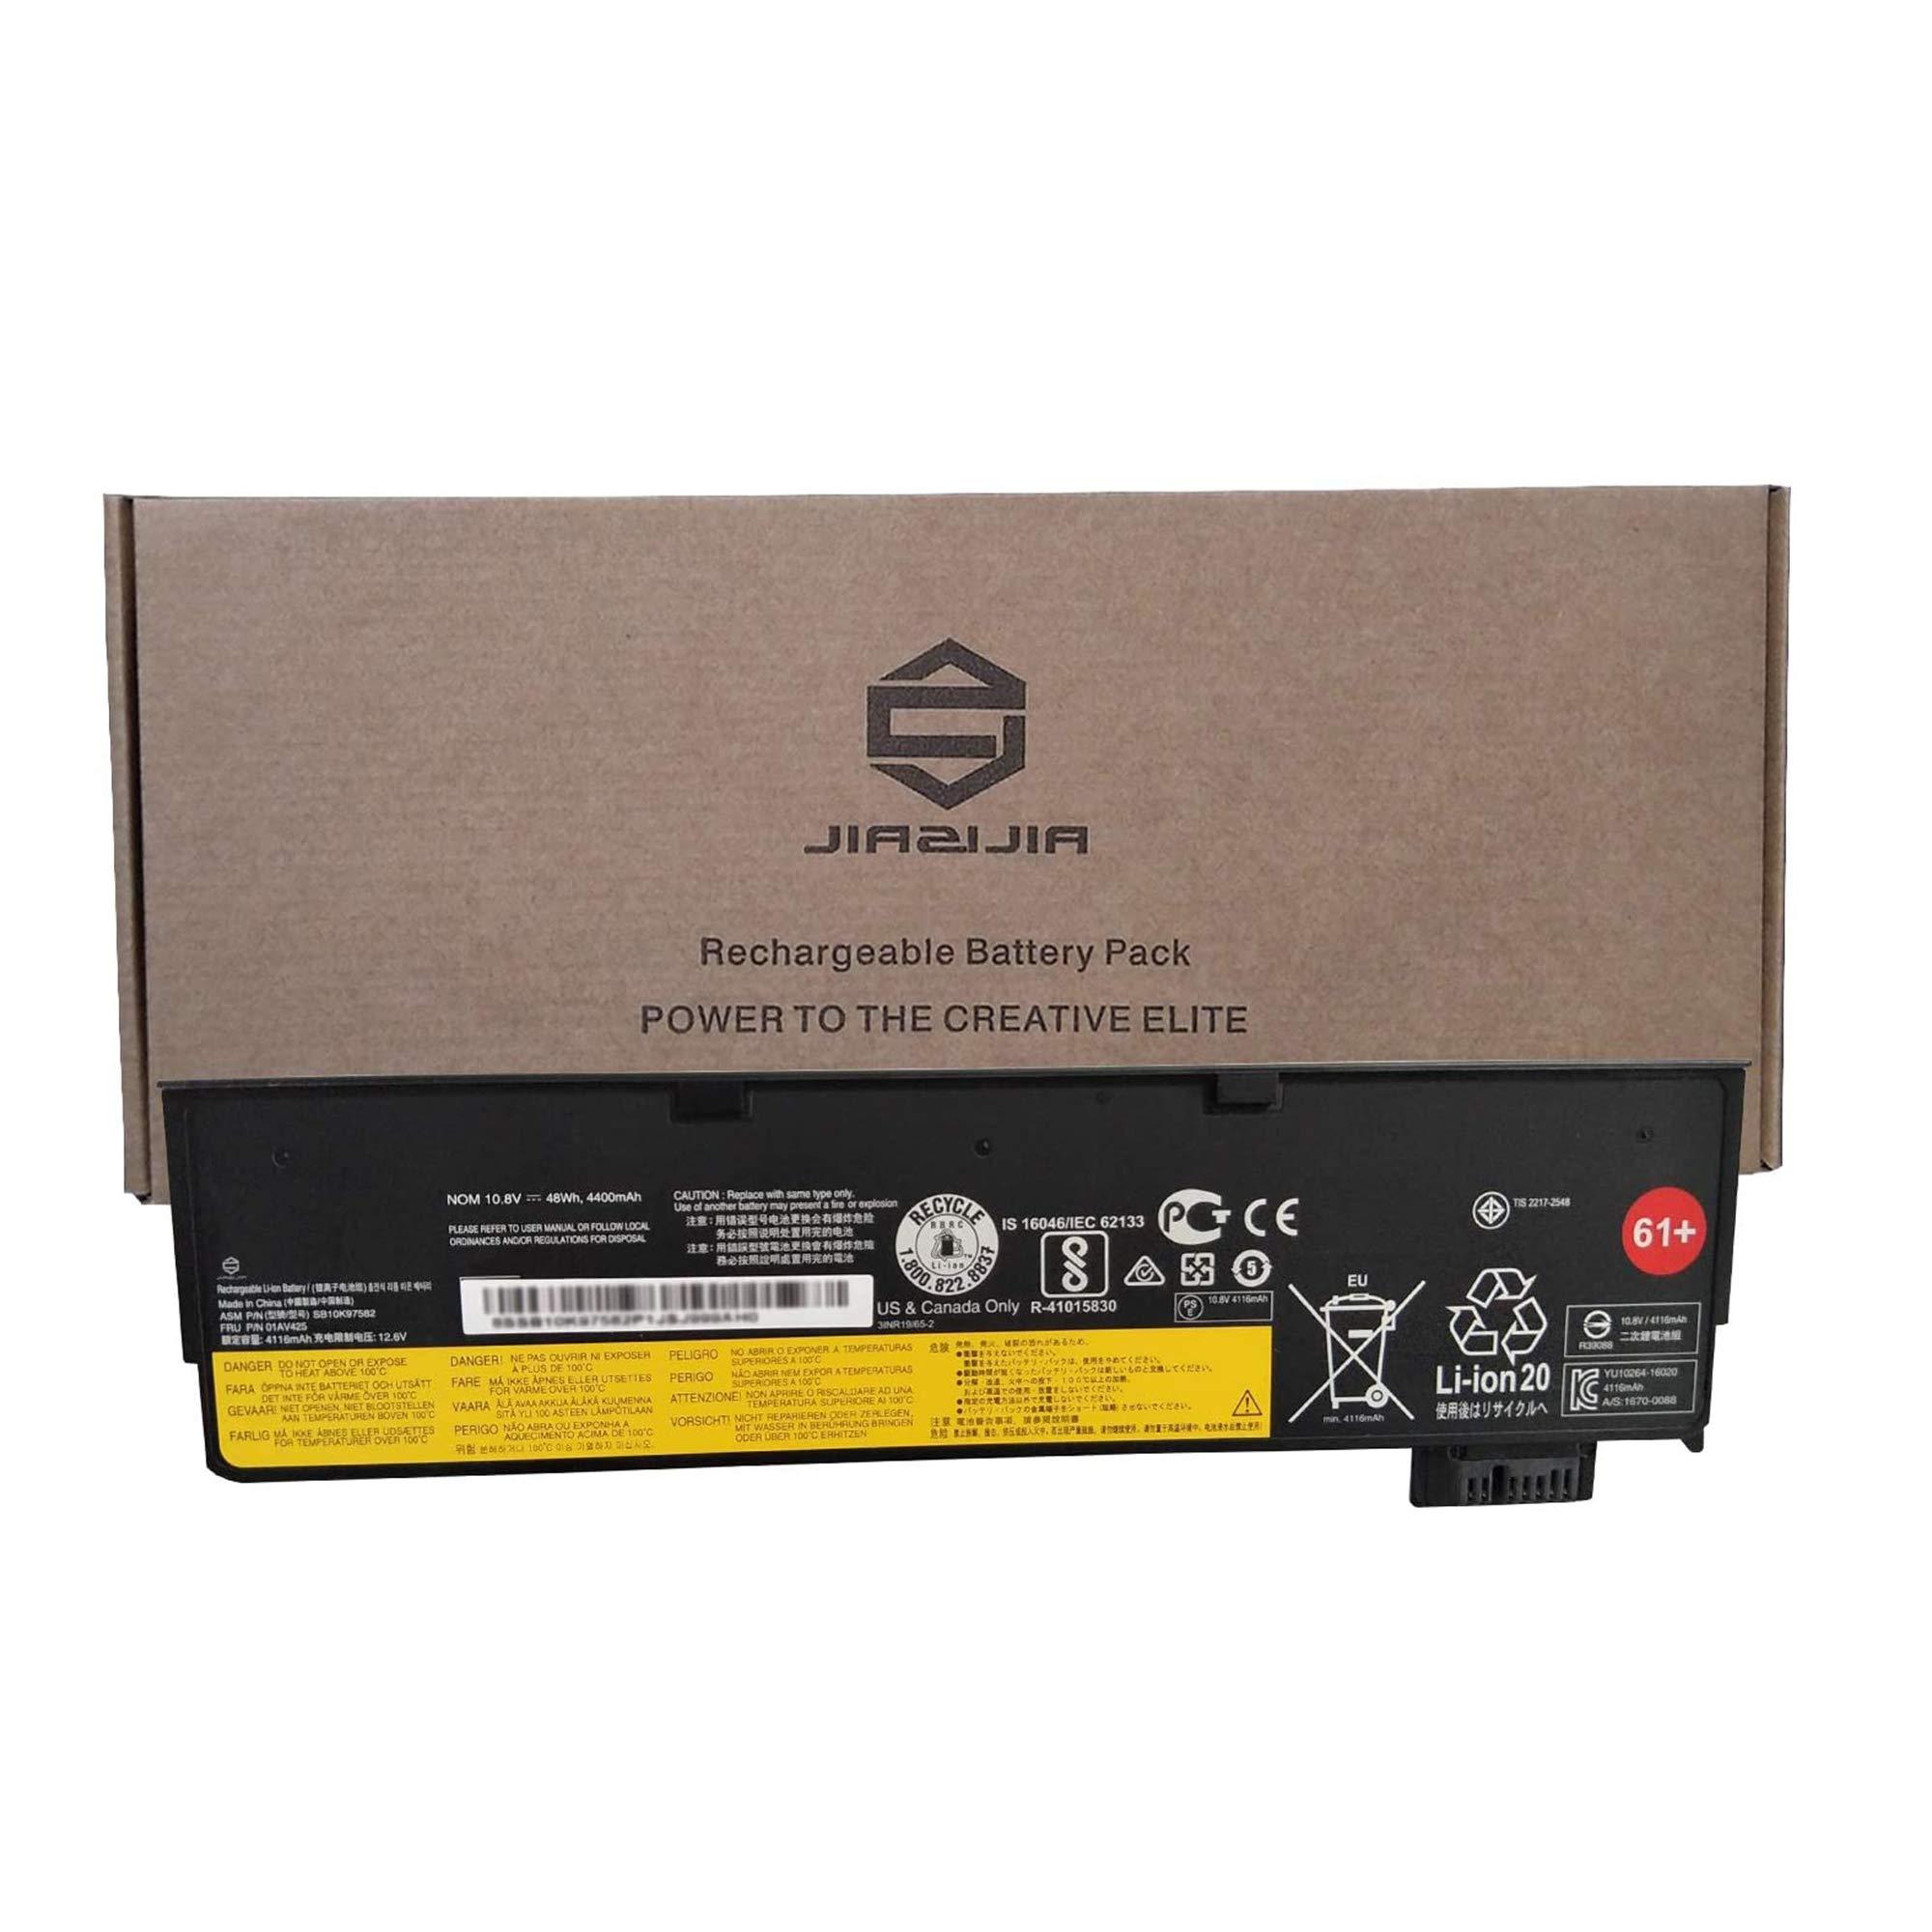 JIAZIJIA 01AV425 Laptop Battery Replacement for Lenovo ThinkPad T470 T570 T480 T580 A475 P51S P52S TP25 Series 61+ 4X50M0881 01AV491 SB10K97582 SB10K97583 L18M6P71 SB10K97661 02DL023 10.8V 48Wh